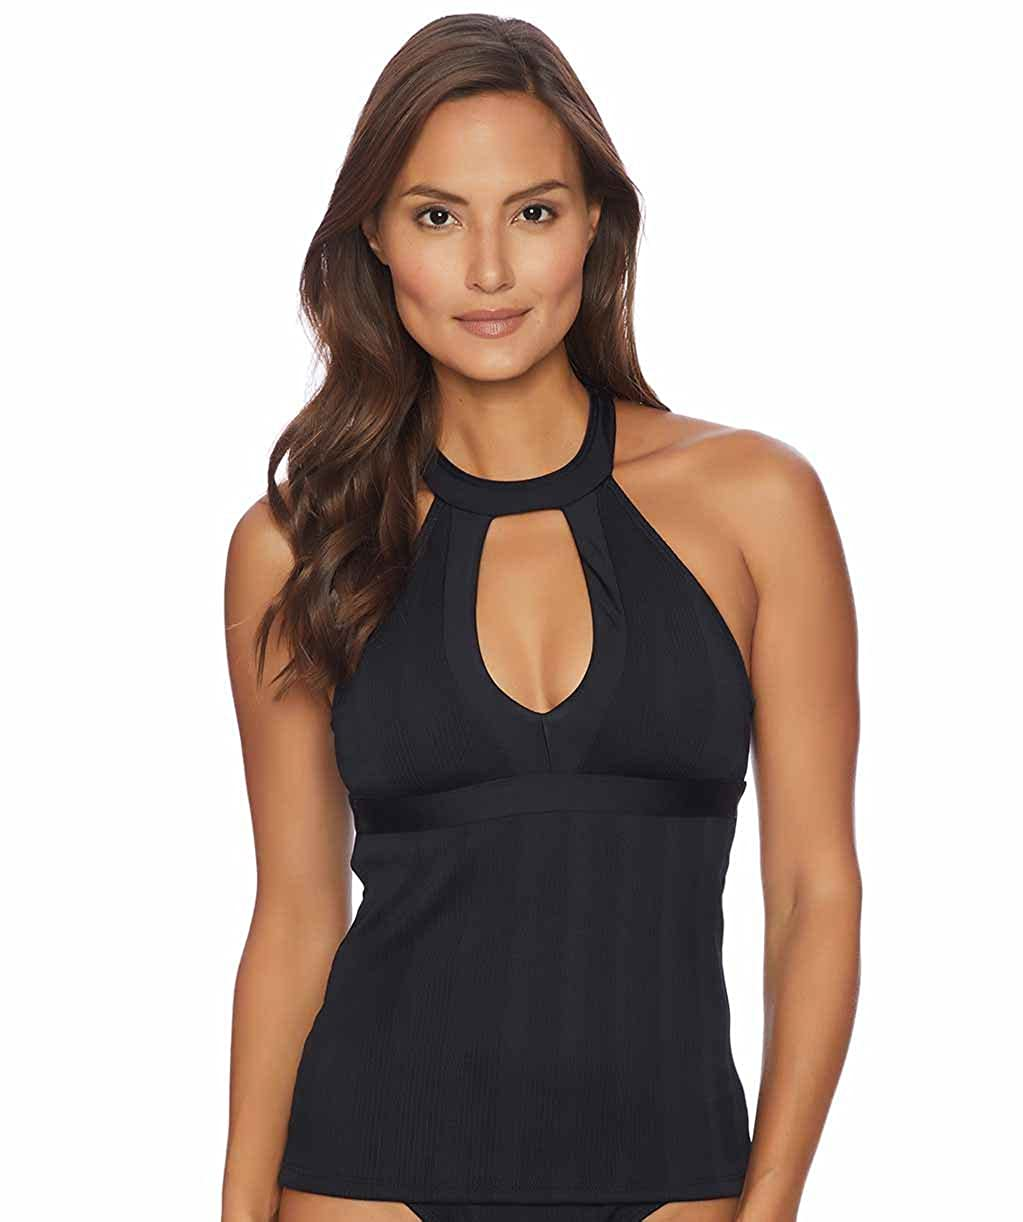 Athena Womens Standard Fine Line Halter Swimsuit Tankini Top Athena Women' s Swimwear AT16298